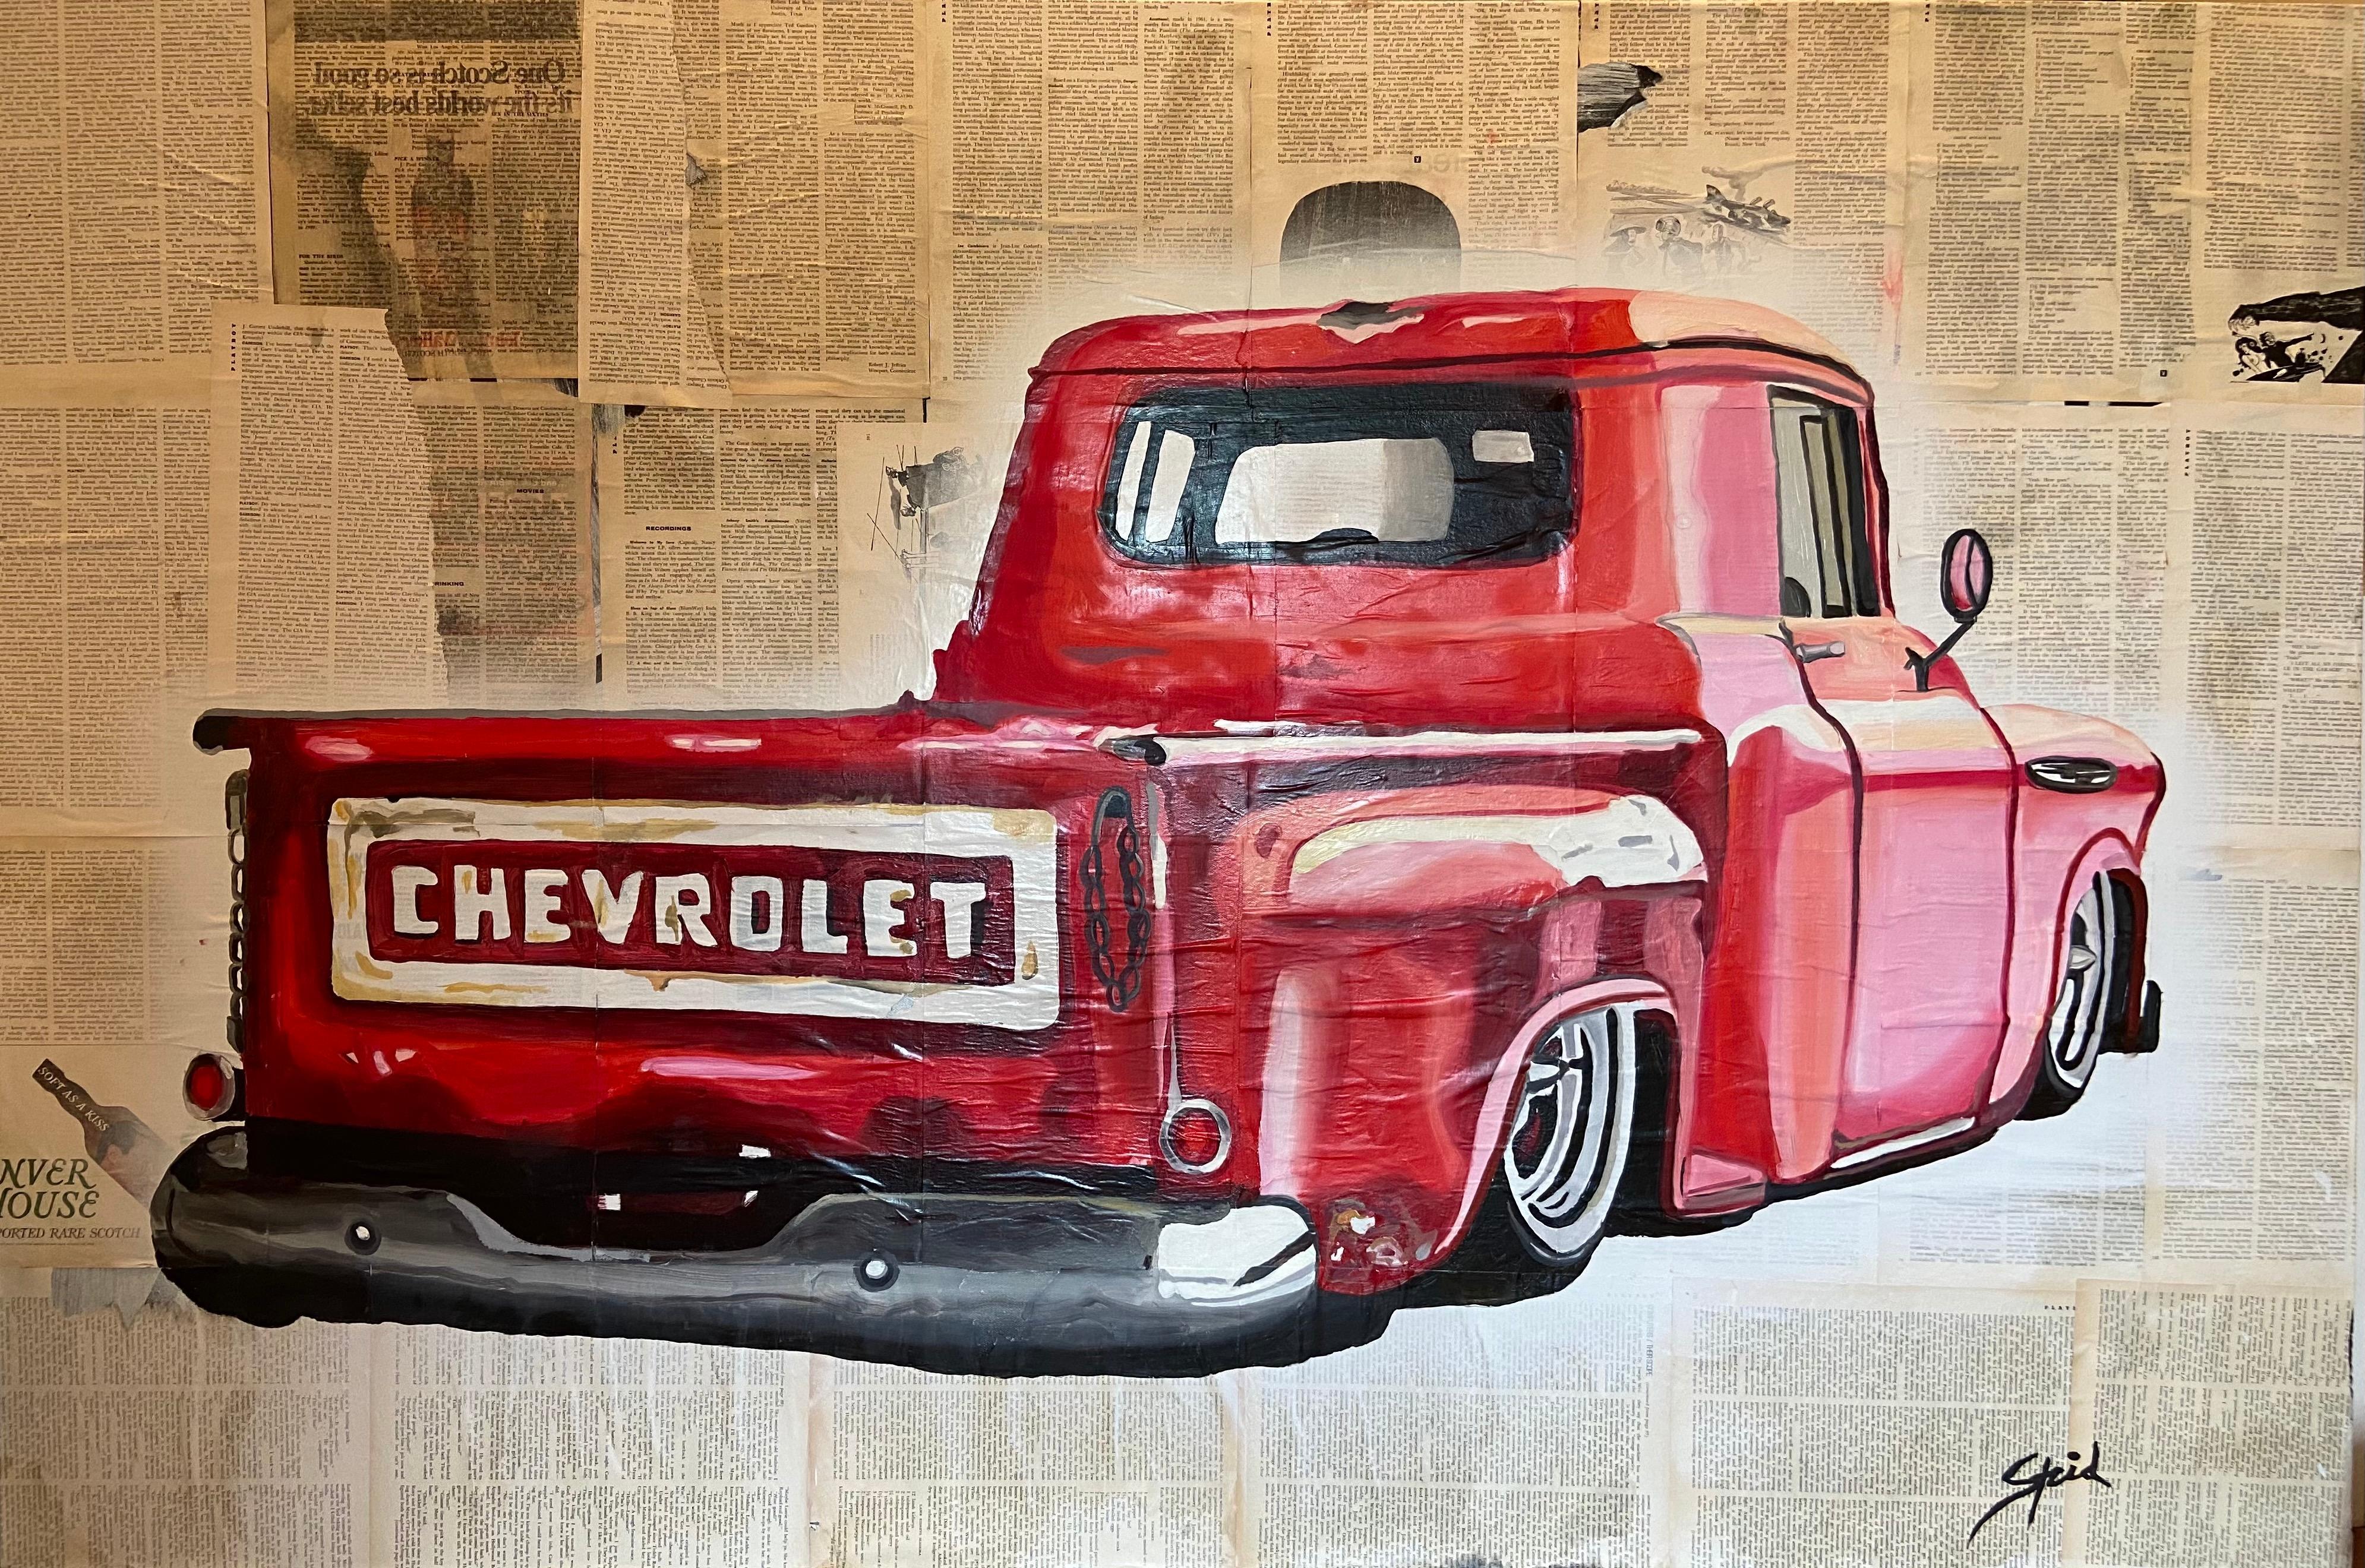 67 Chevy Playboy